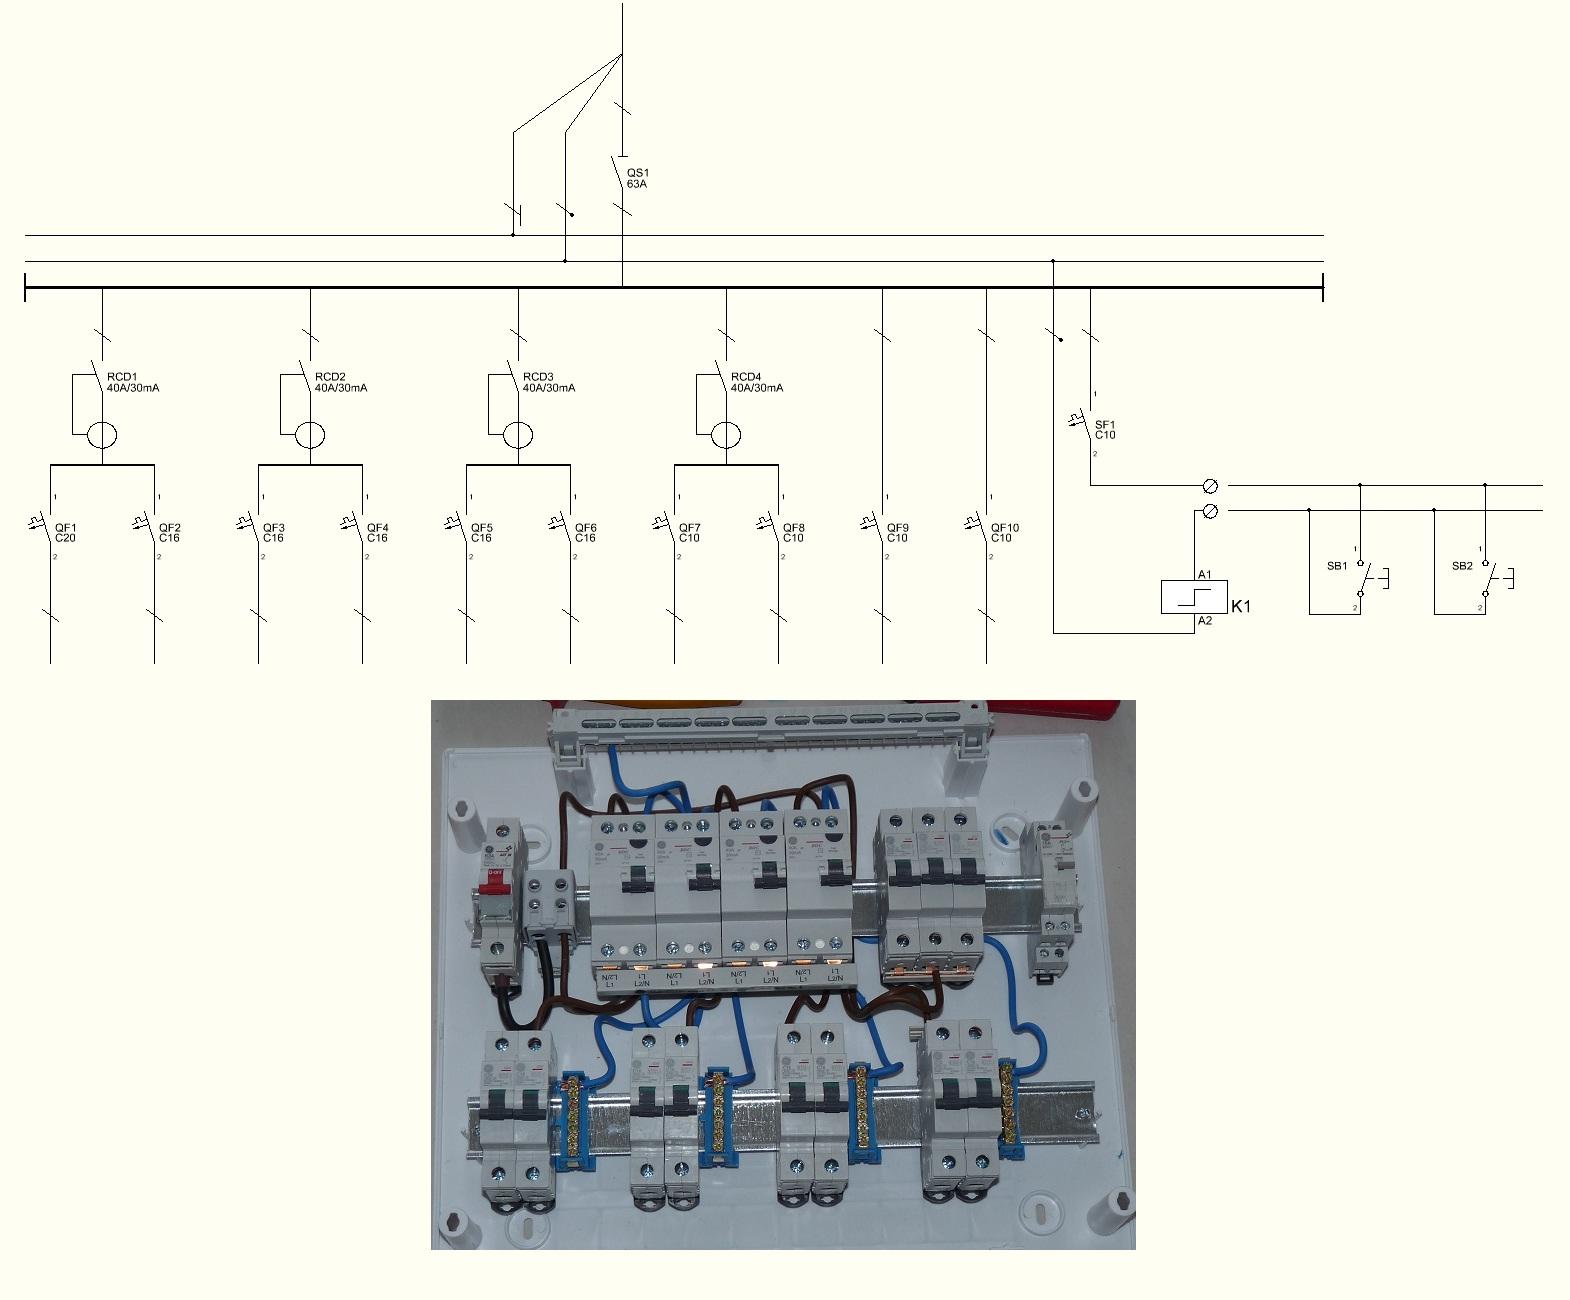 700r4 plug wiring diagram ge refrigerator free engine image for